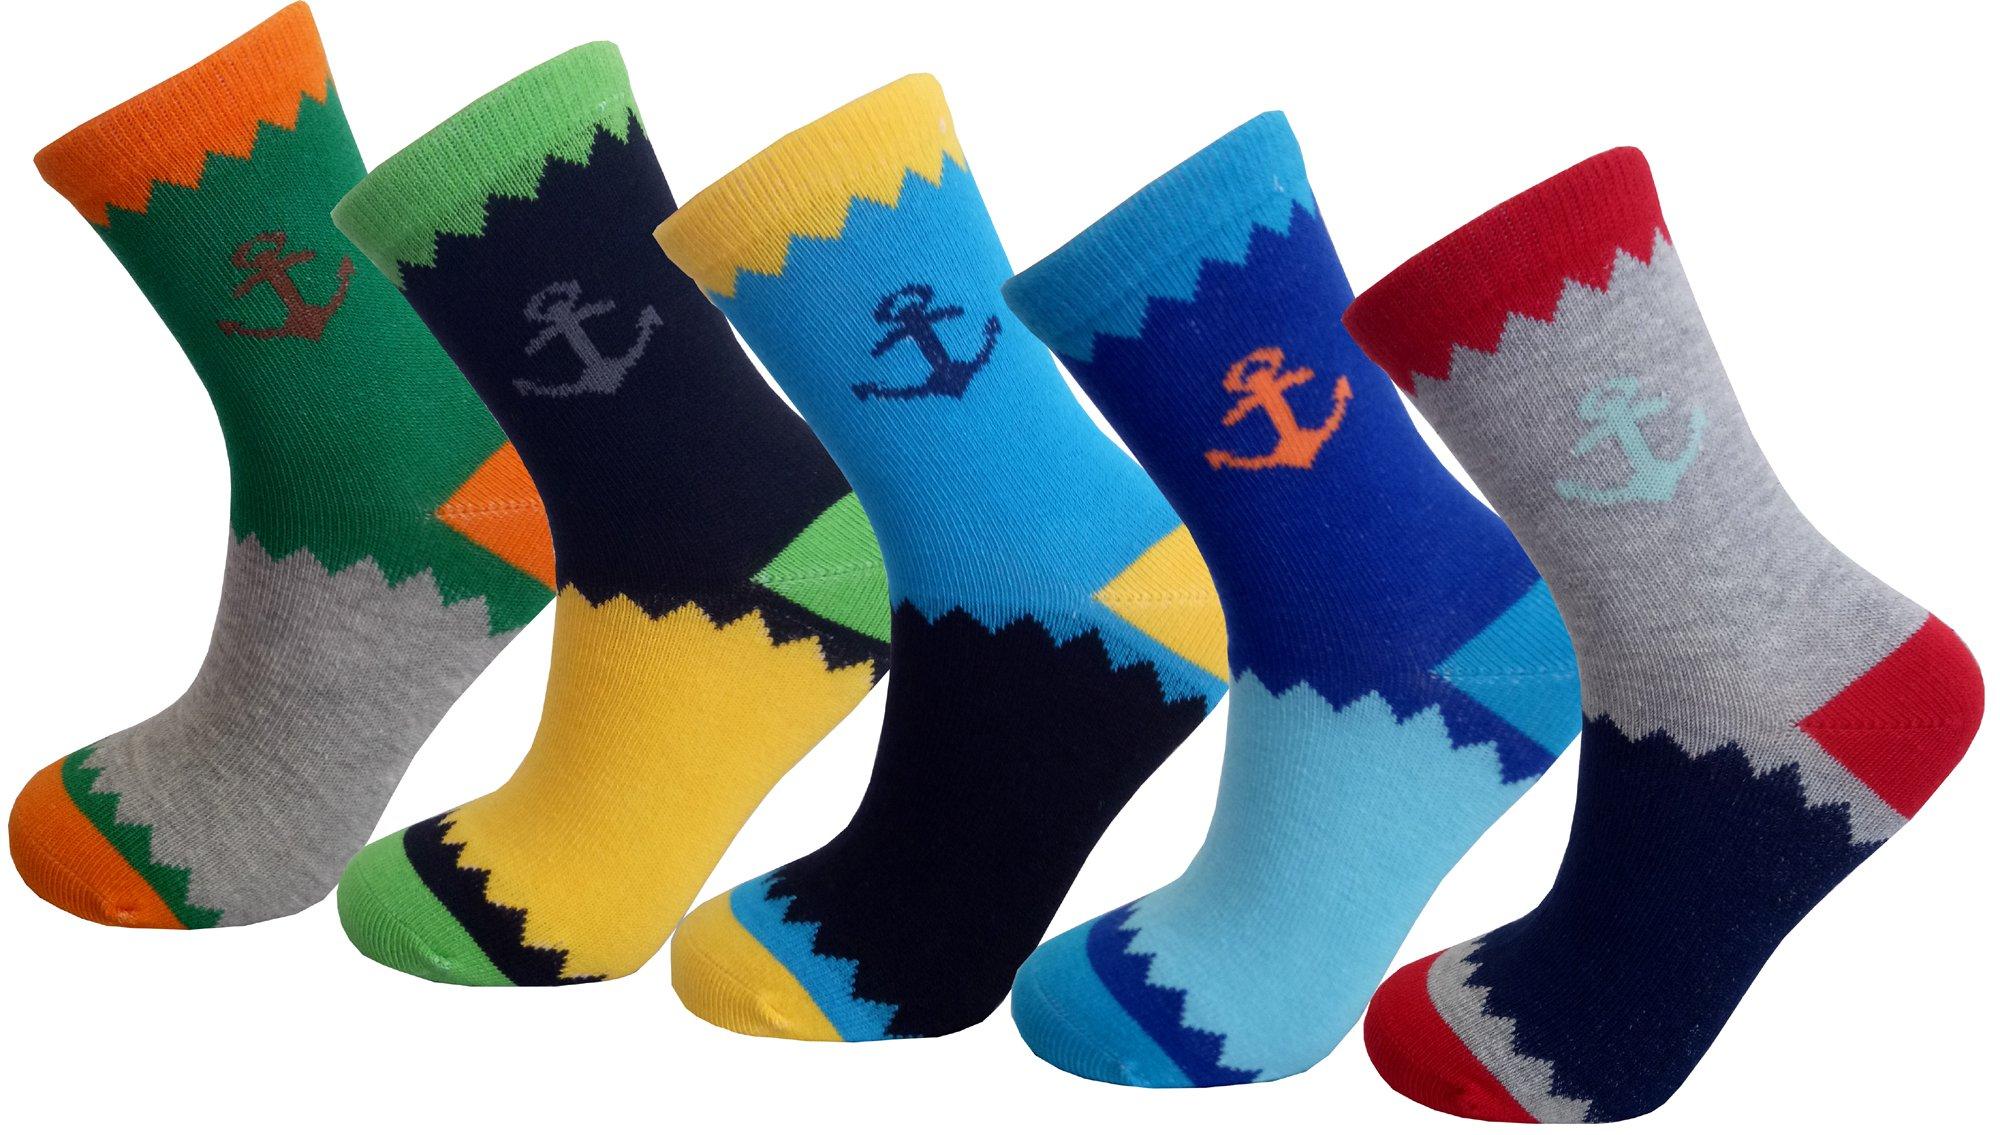 Searchself Boys Color Stripe Seamless Cotton Dress Socks (9-12 Years, Set 8)